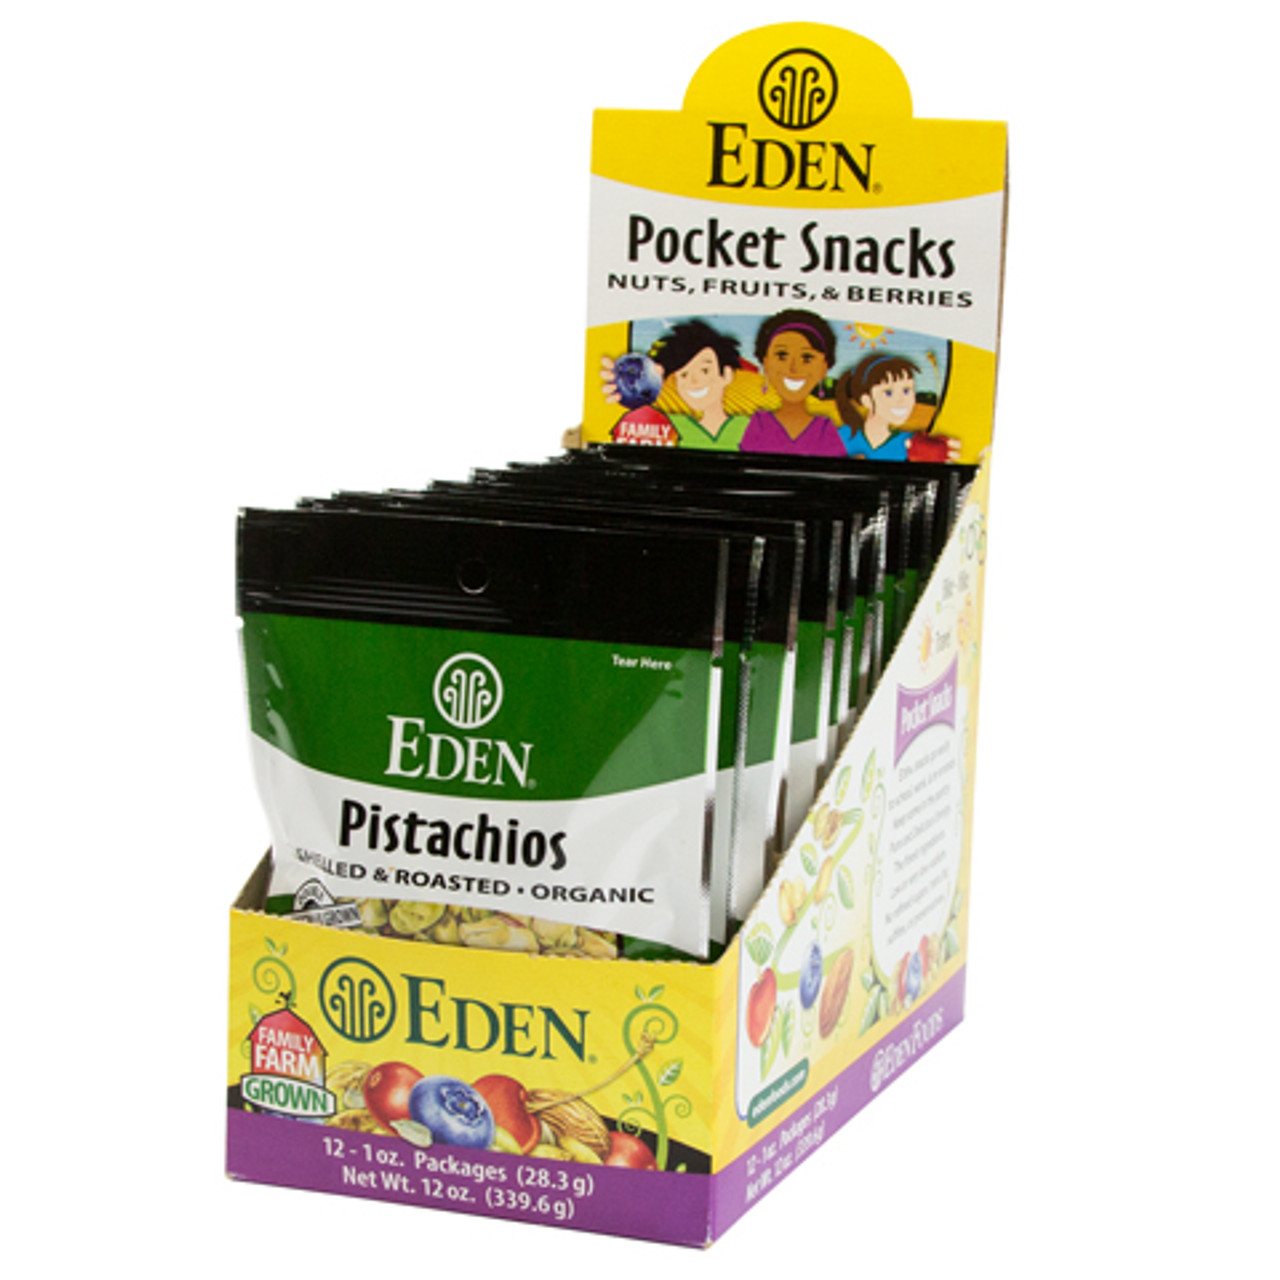 Pistachios Pocket Snacks, Organic - 12 pack